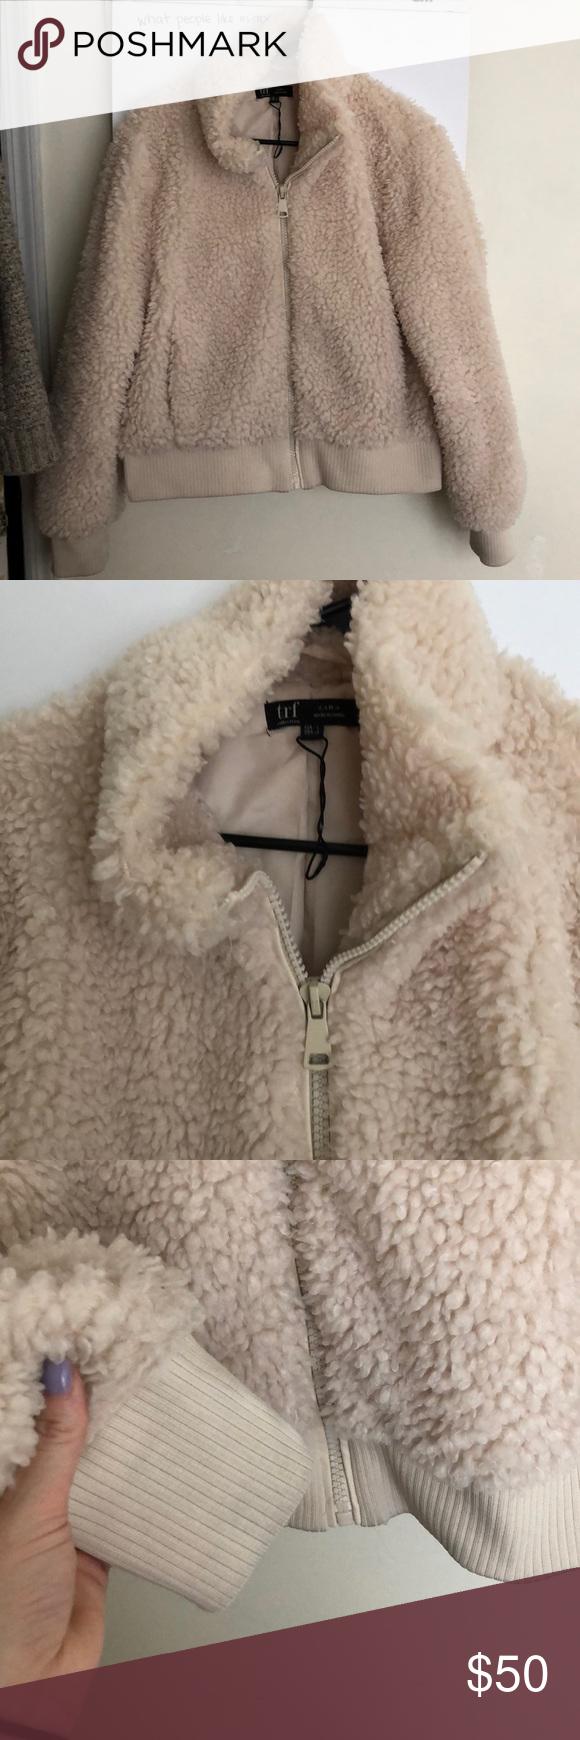 Zara Trf Faux Sherpa Bomber Jacket Zara Jackets Bomber Jacket [ 1740 x 580 Pixel ]